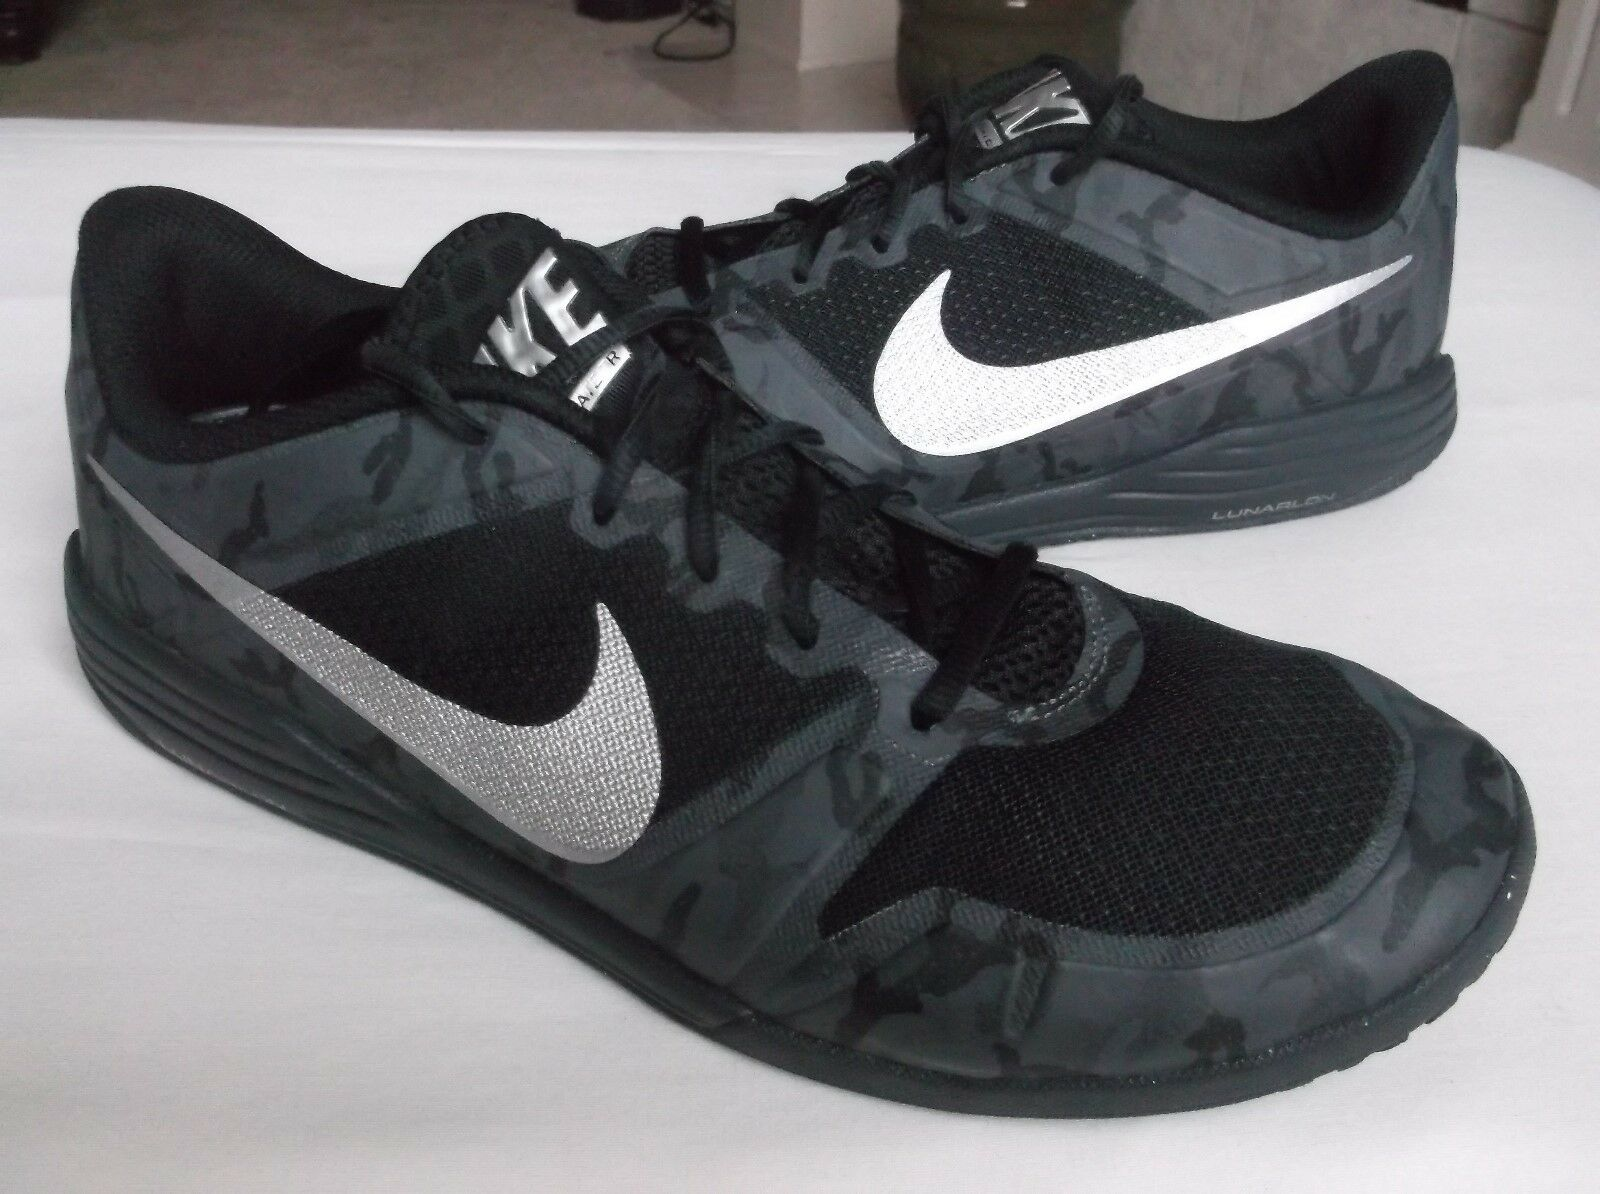 nike lunarlon lunar sneakers, ultimative tr männer schwarze trainer sportliche sneakers, lunar schuhe, 10. 7735da